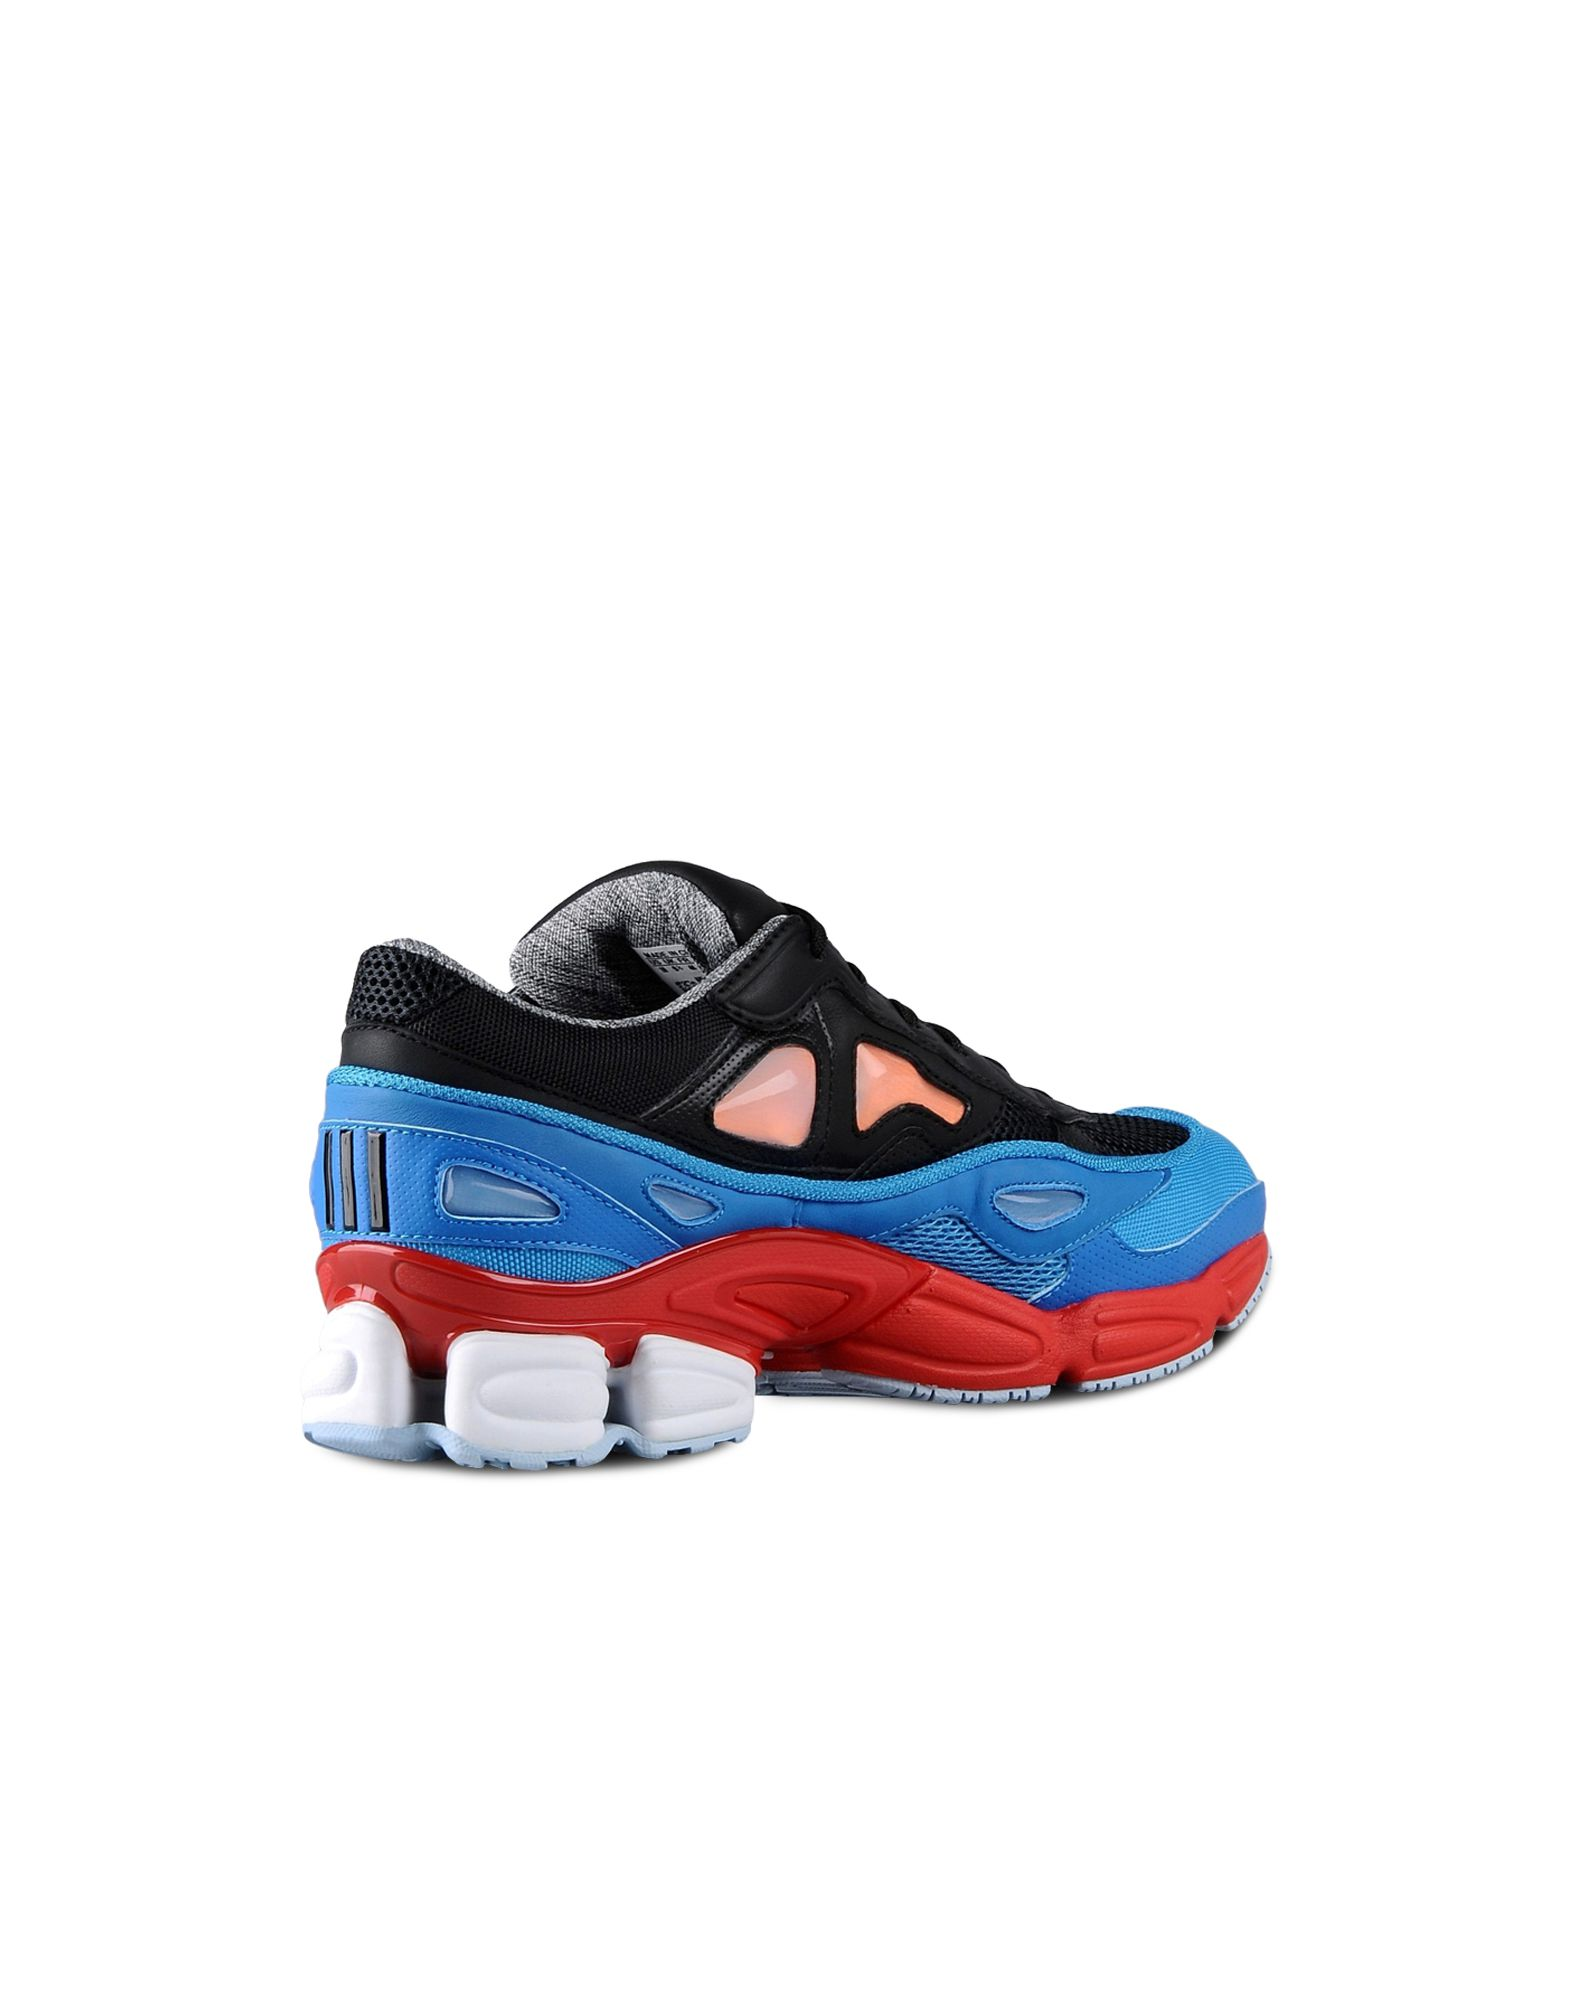 RAF SIMONS OZWEEGO 2 Shoes unisex Y 3 adidas